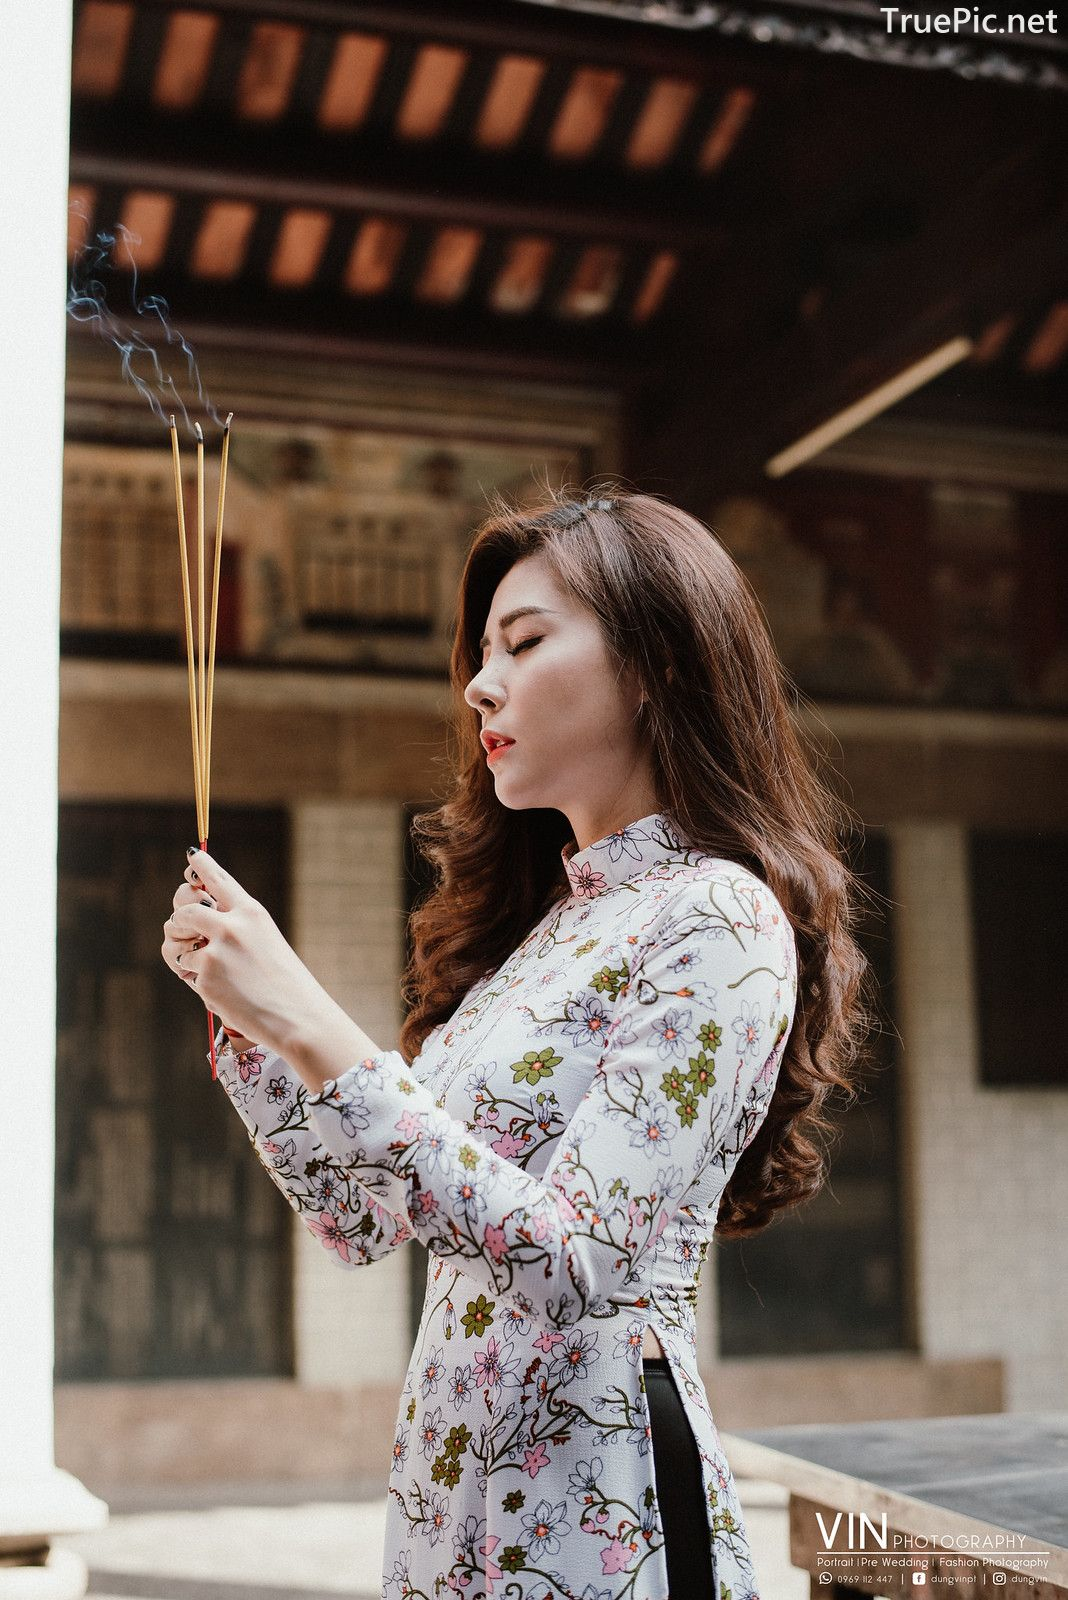 Image-Vietnamese-Beautiful-Girl-Ao-Dai-Vietnam-Traditional-Dress-by-VIN-Photo-3-TruePic.net- Picture-8